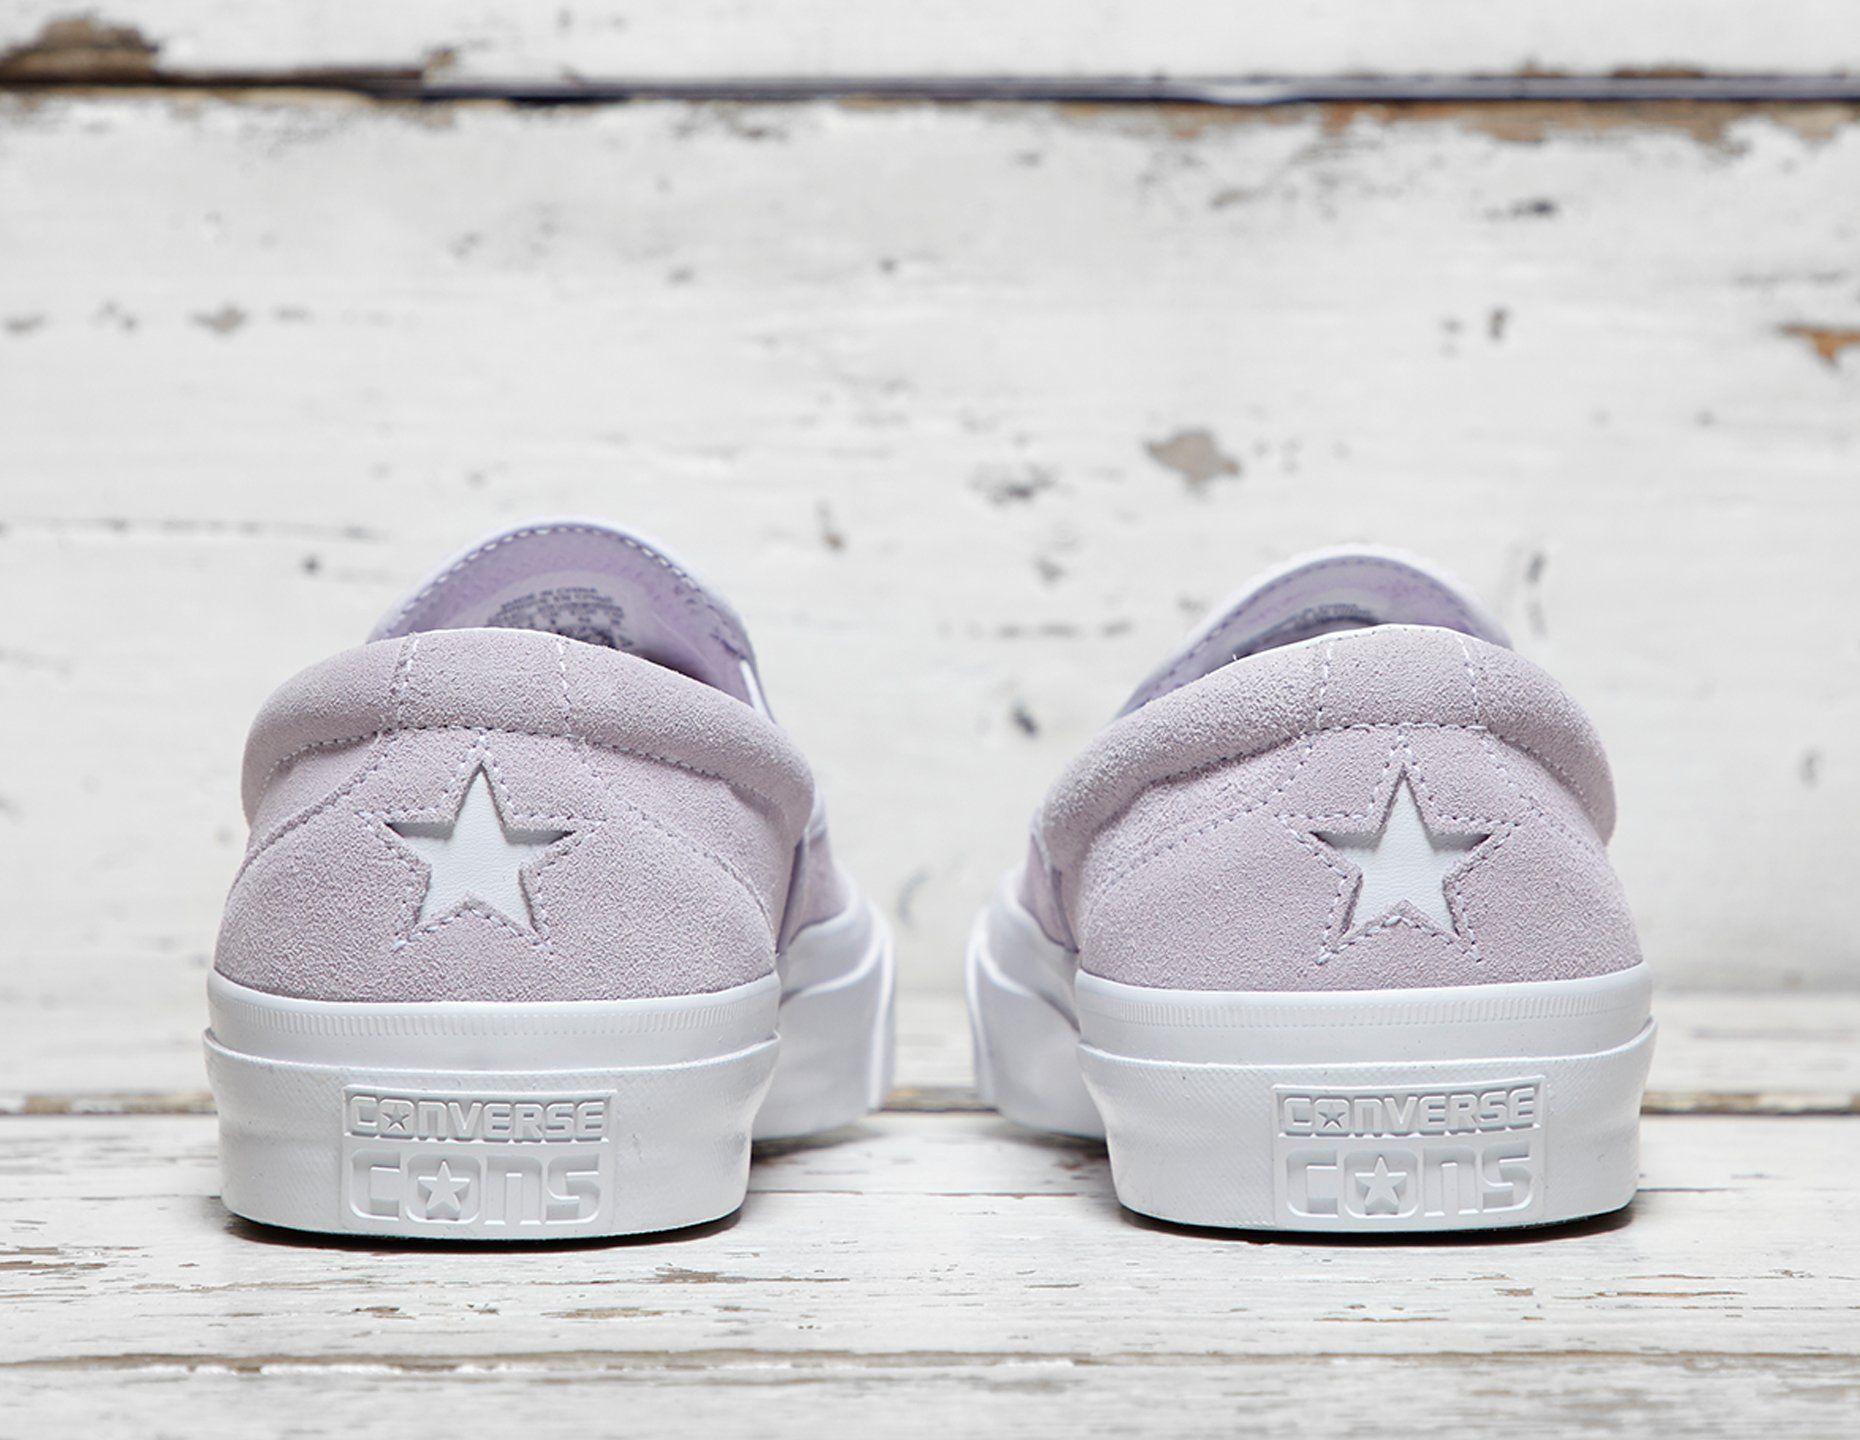 Converse One Star CC Slip-On